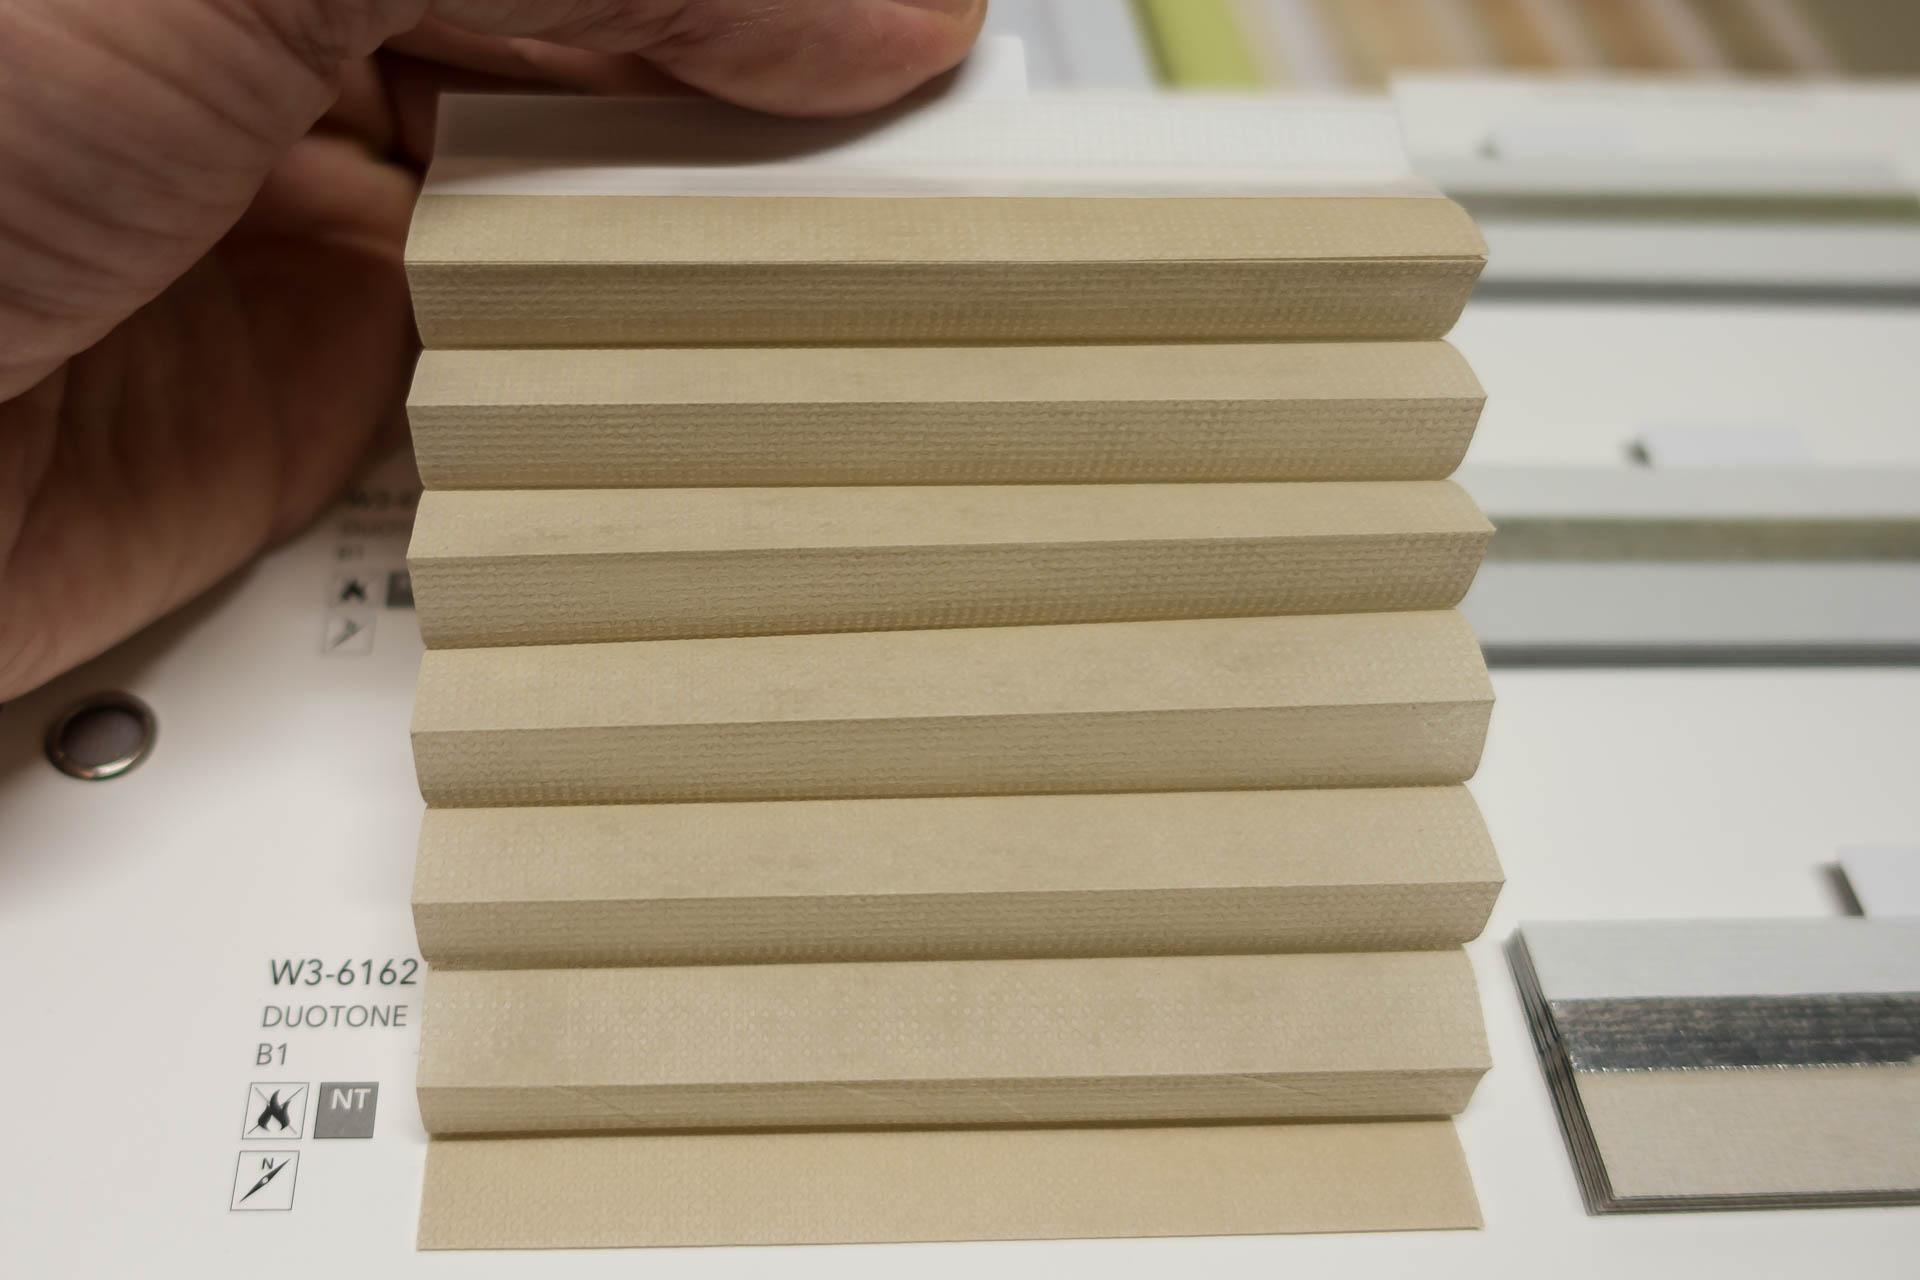 "Waben-Plissee-Stoff aus der Farbkarte ""Duotone B1"" | Material: 100 % PES schwer entflammbar nach DIN 4102 B1"